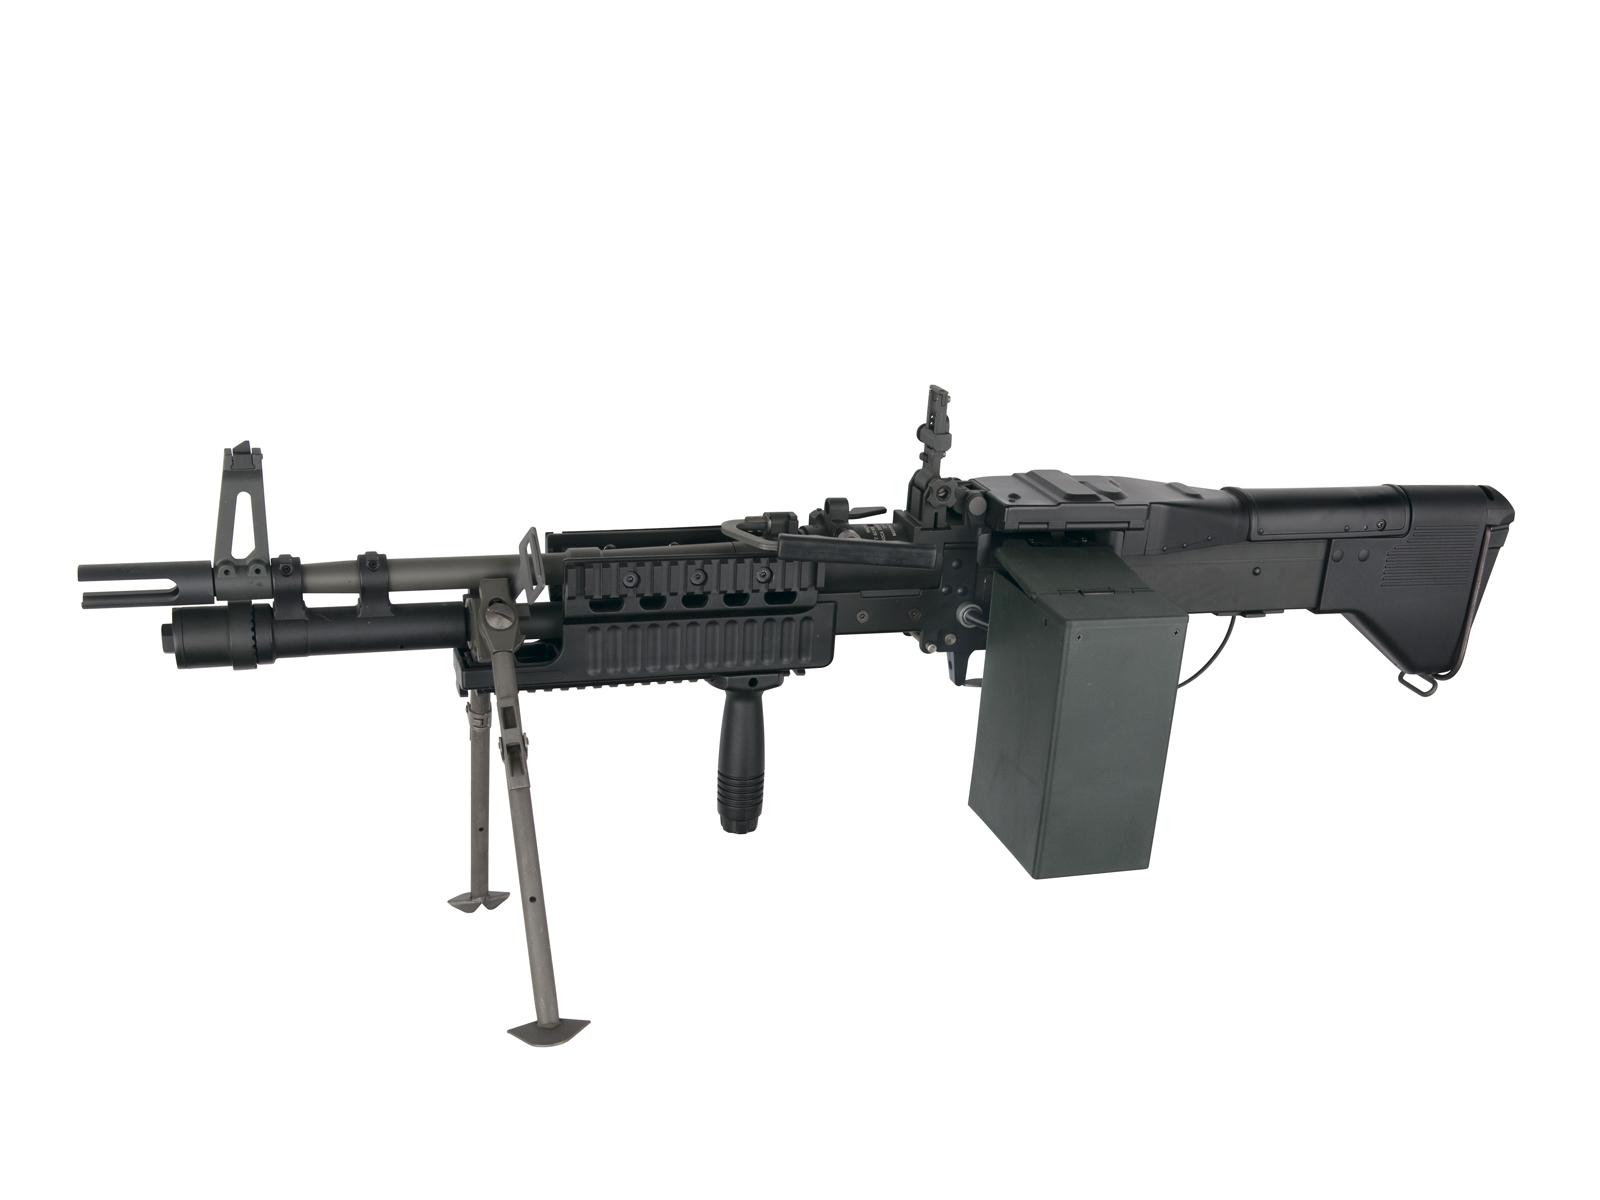 m60 machine gun - photo #10